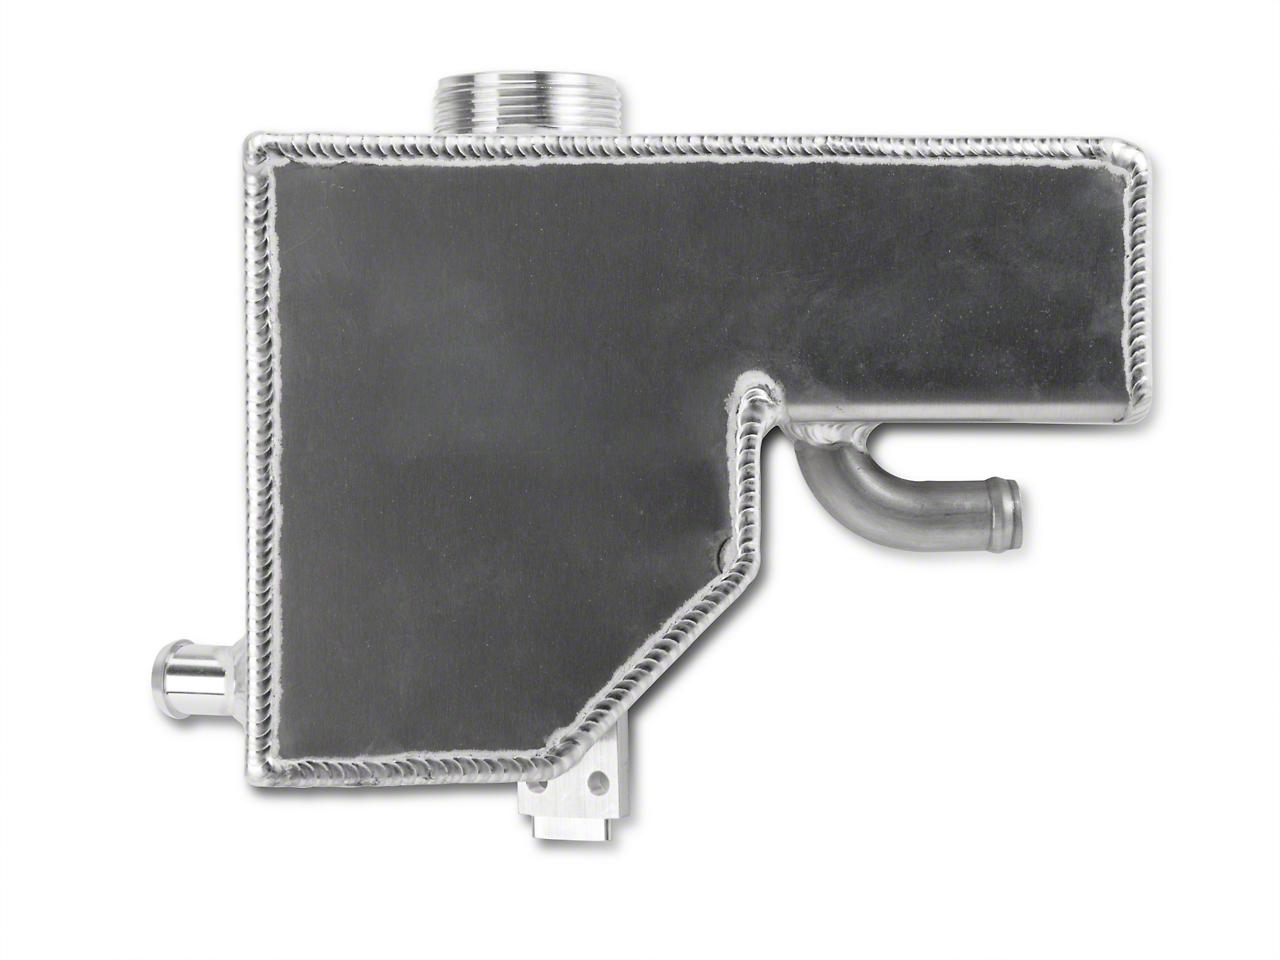 C&R Racing Supercharger Coolant Expansion Tank Reservoir (13-14 GT500)